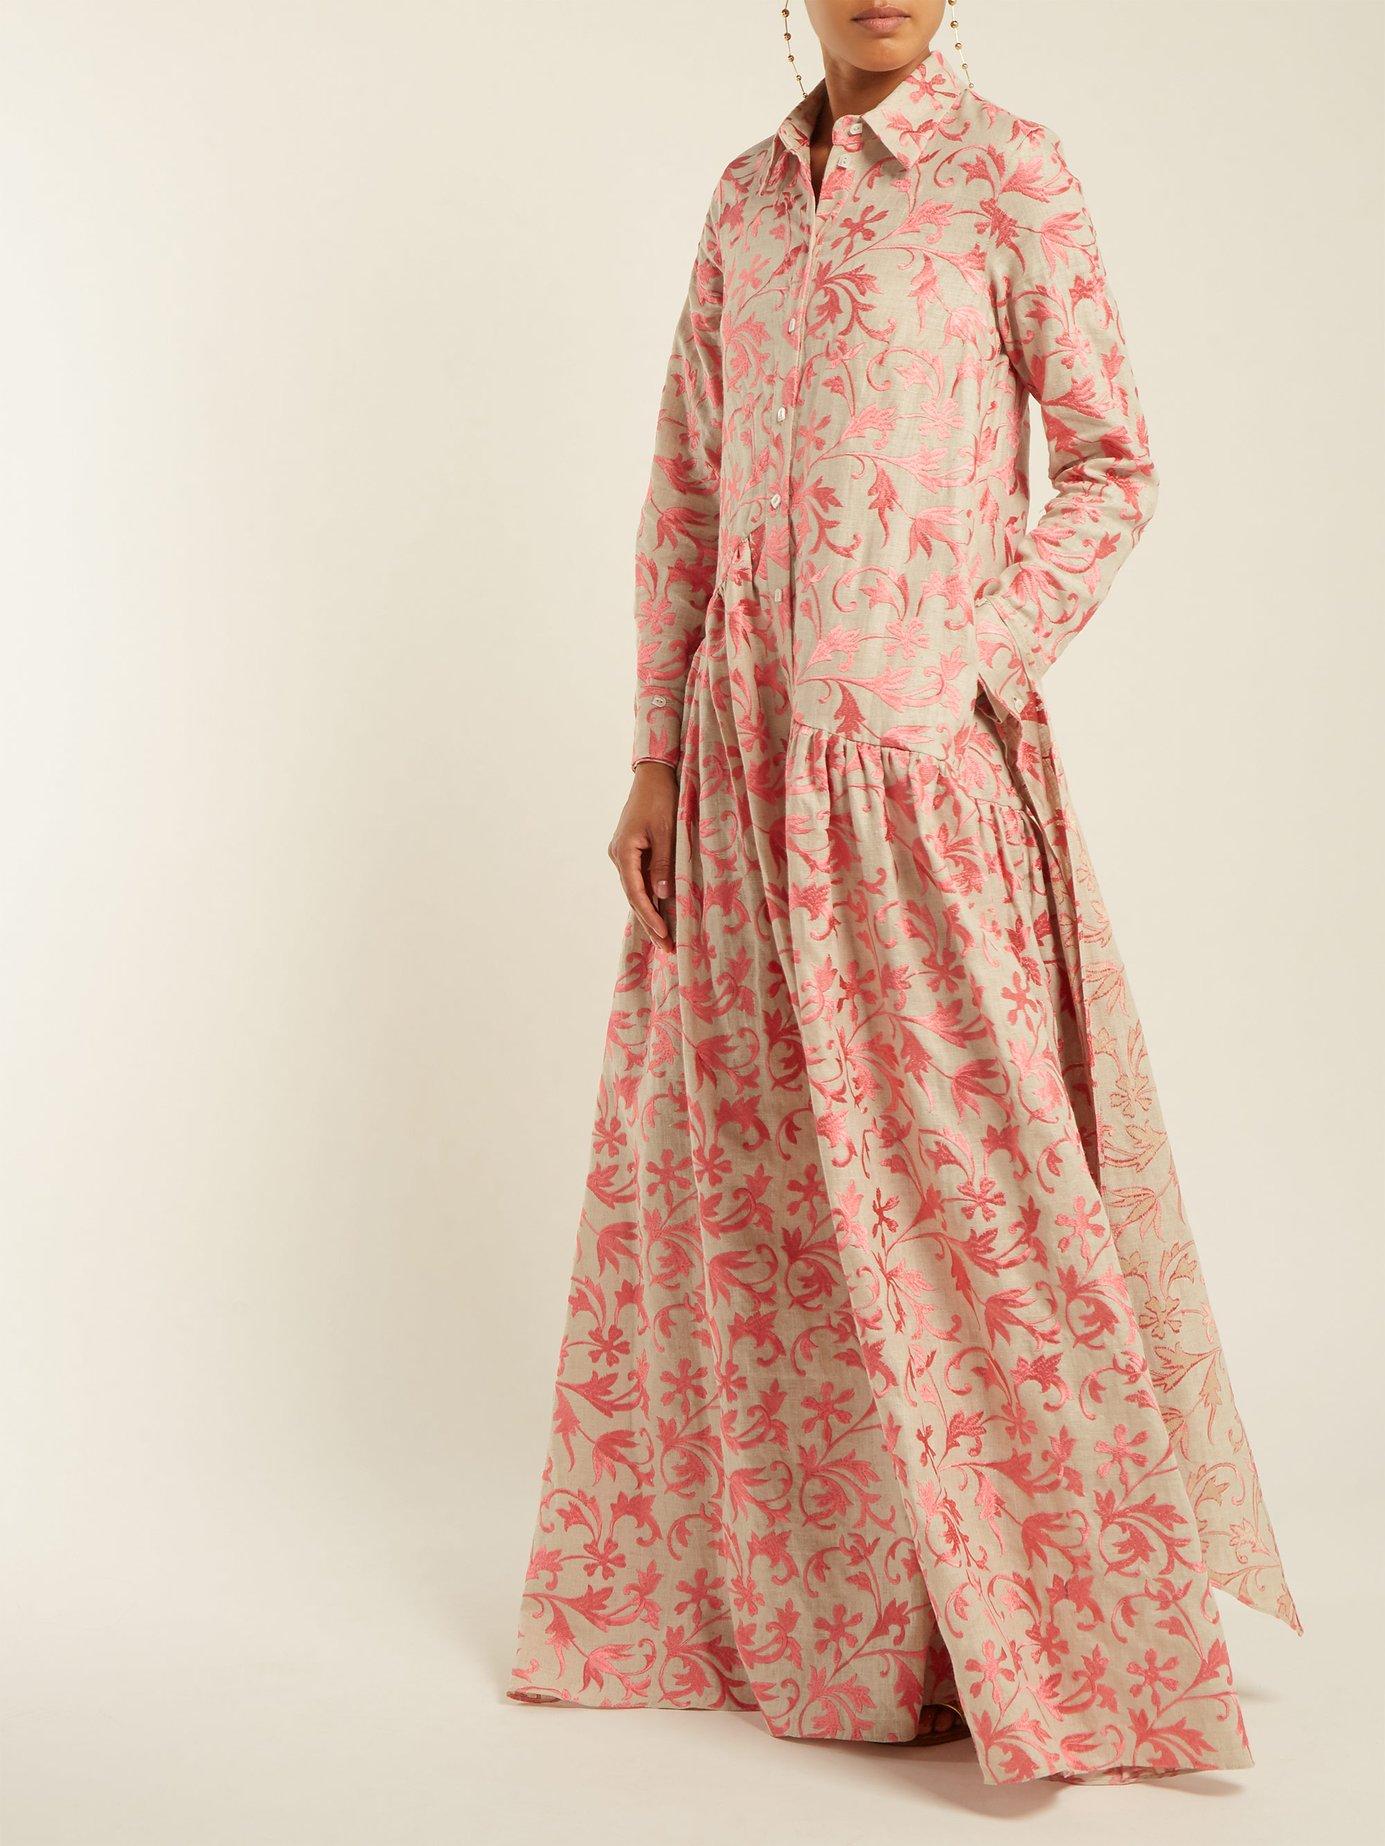 Evaline embroidered linen dress by Osman